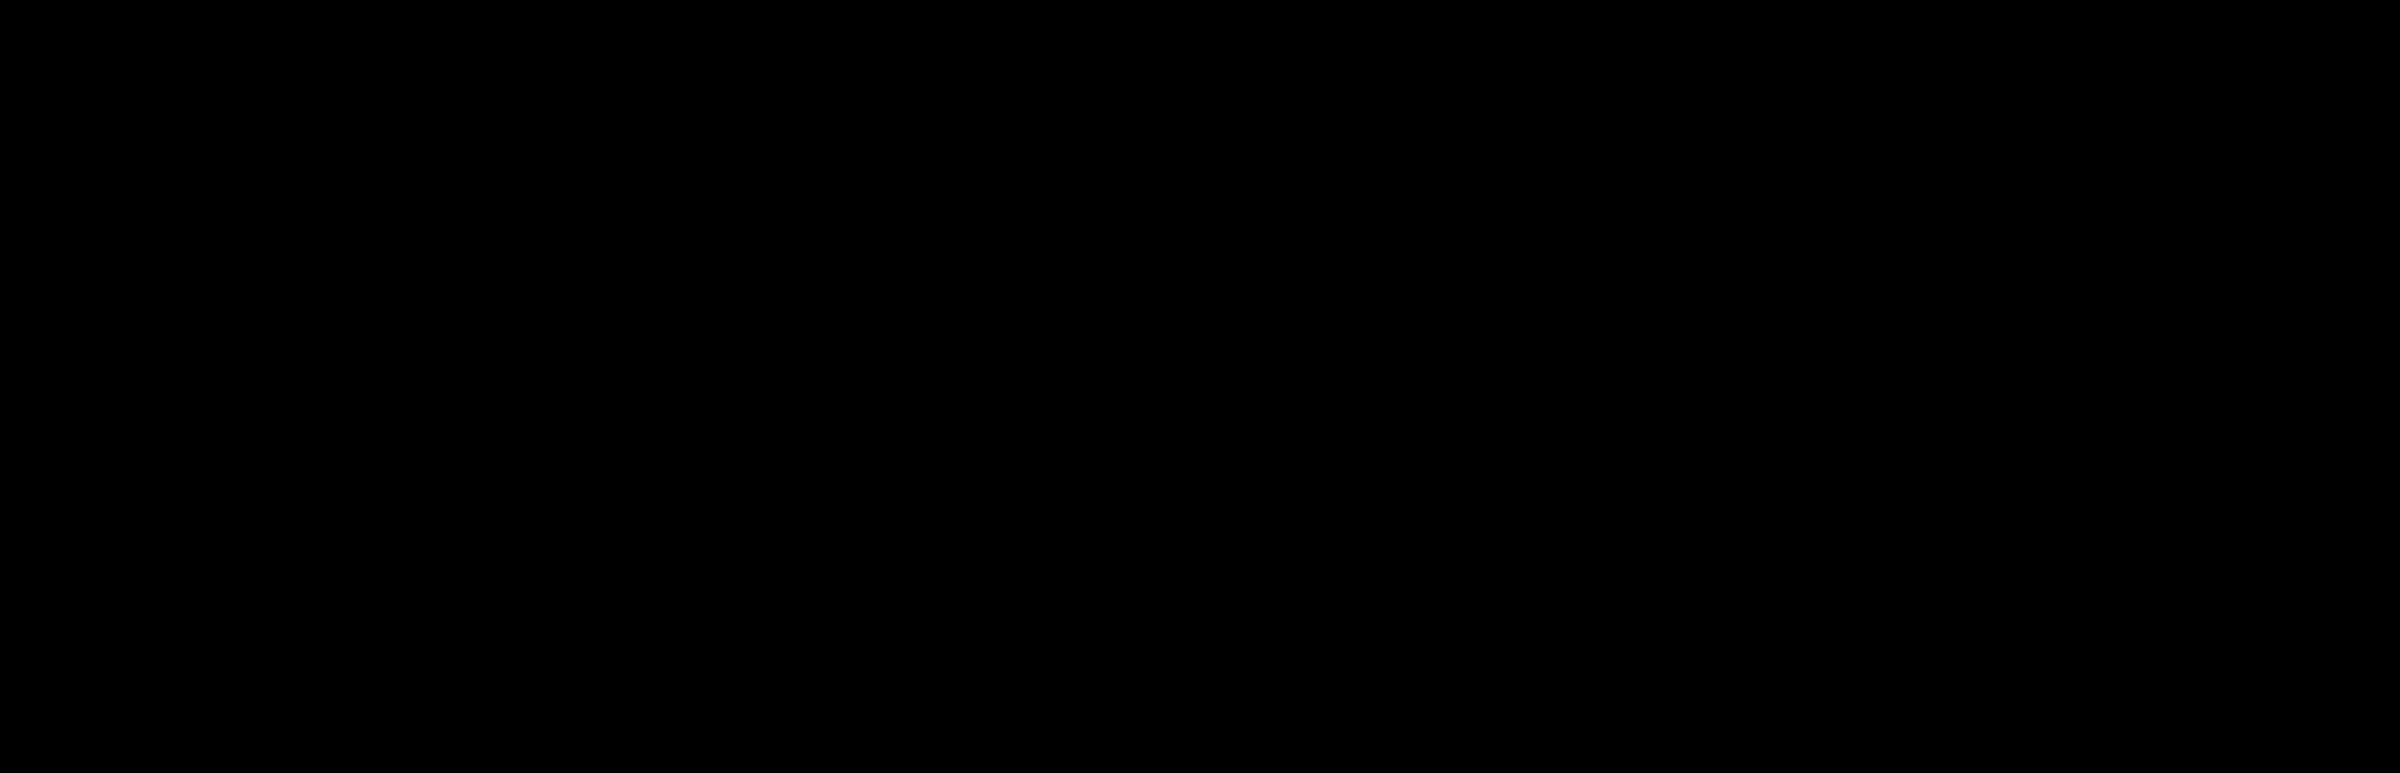 Fitbit Logo PNG Transparent & SVG Vector - Freebie Supply